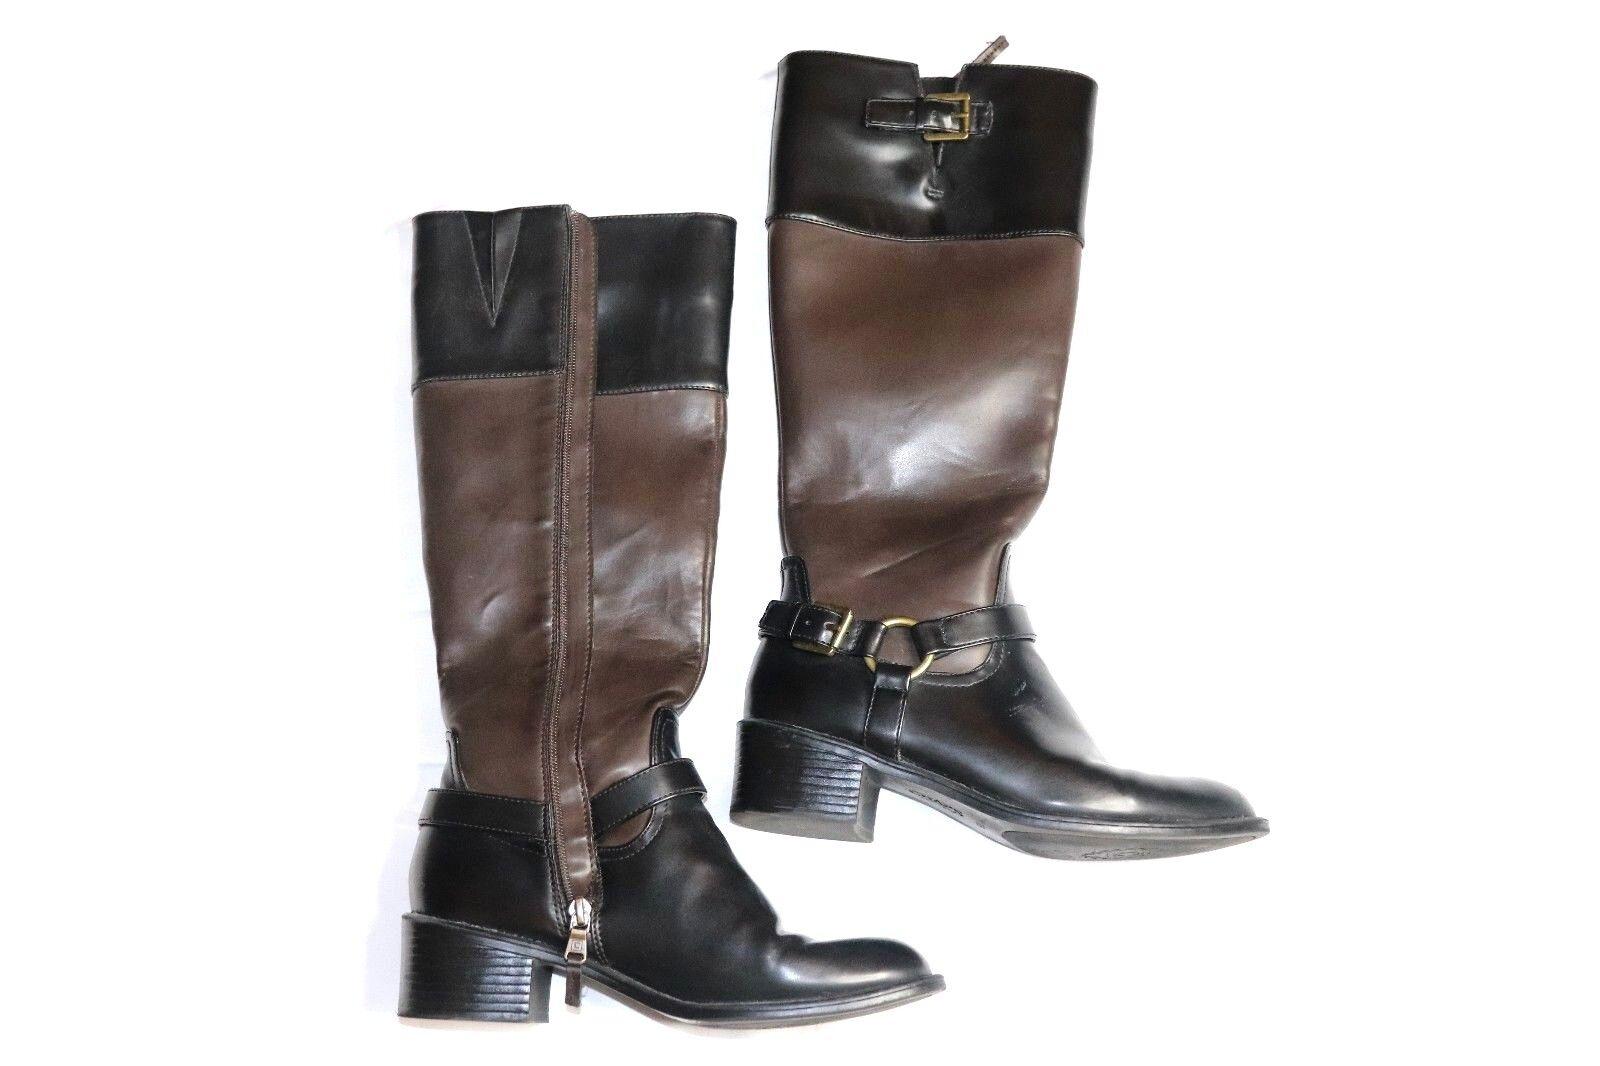 Ralph Lauren Chaps Womens Knee Boots High Brown/Black Buckle Leatherette Boots Knee 7.5 B 820048